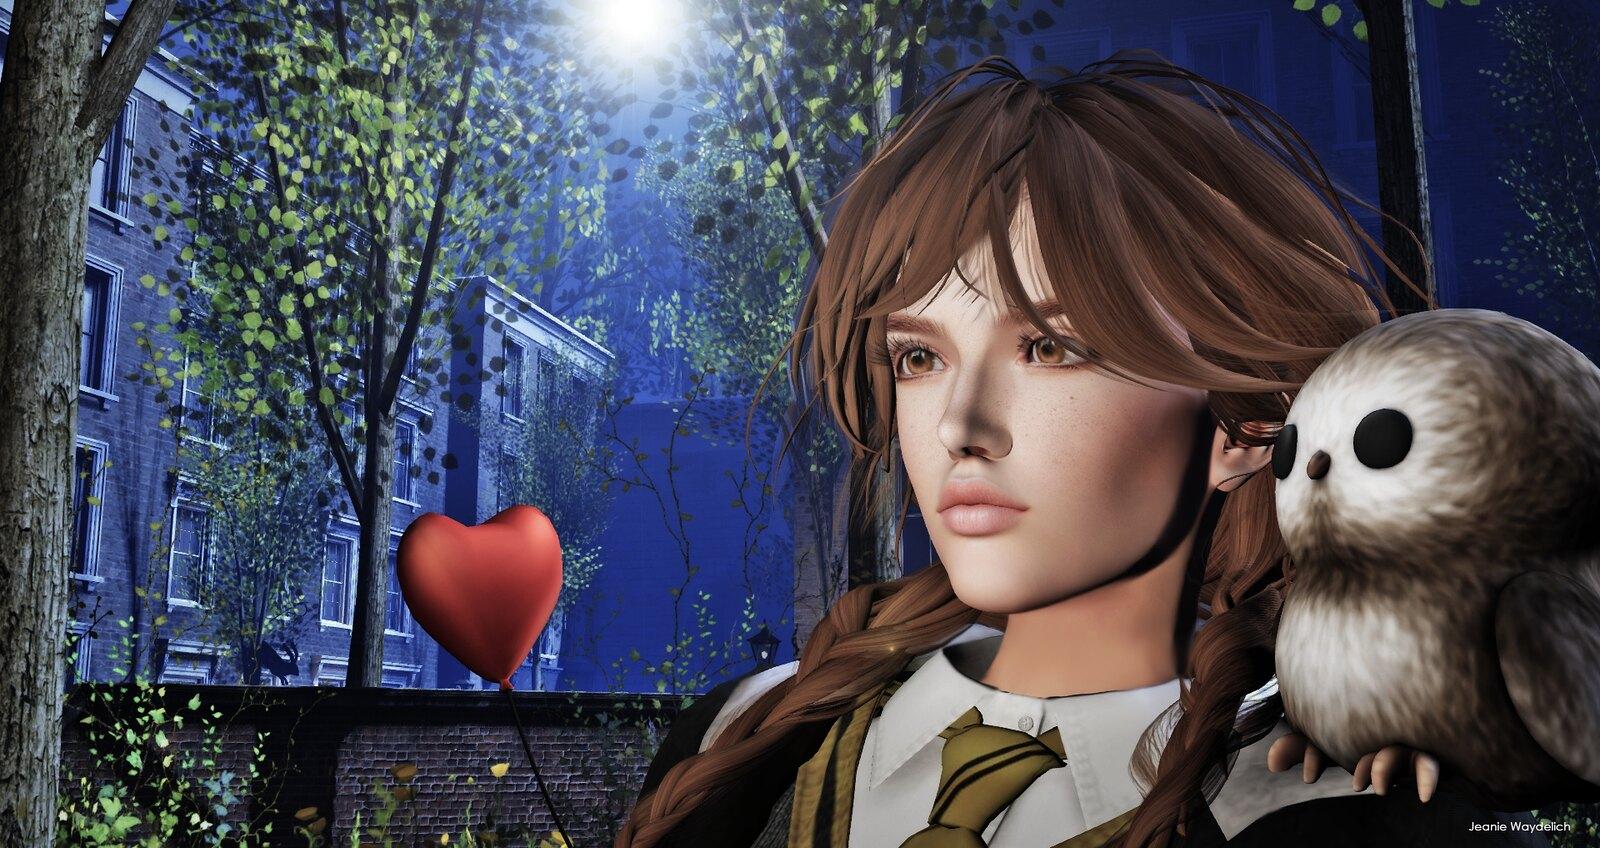 LOTD 822 - Hermione ^^